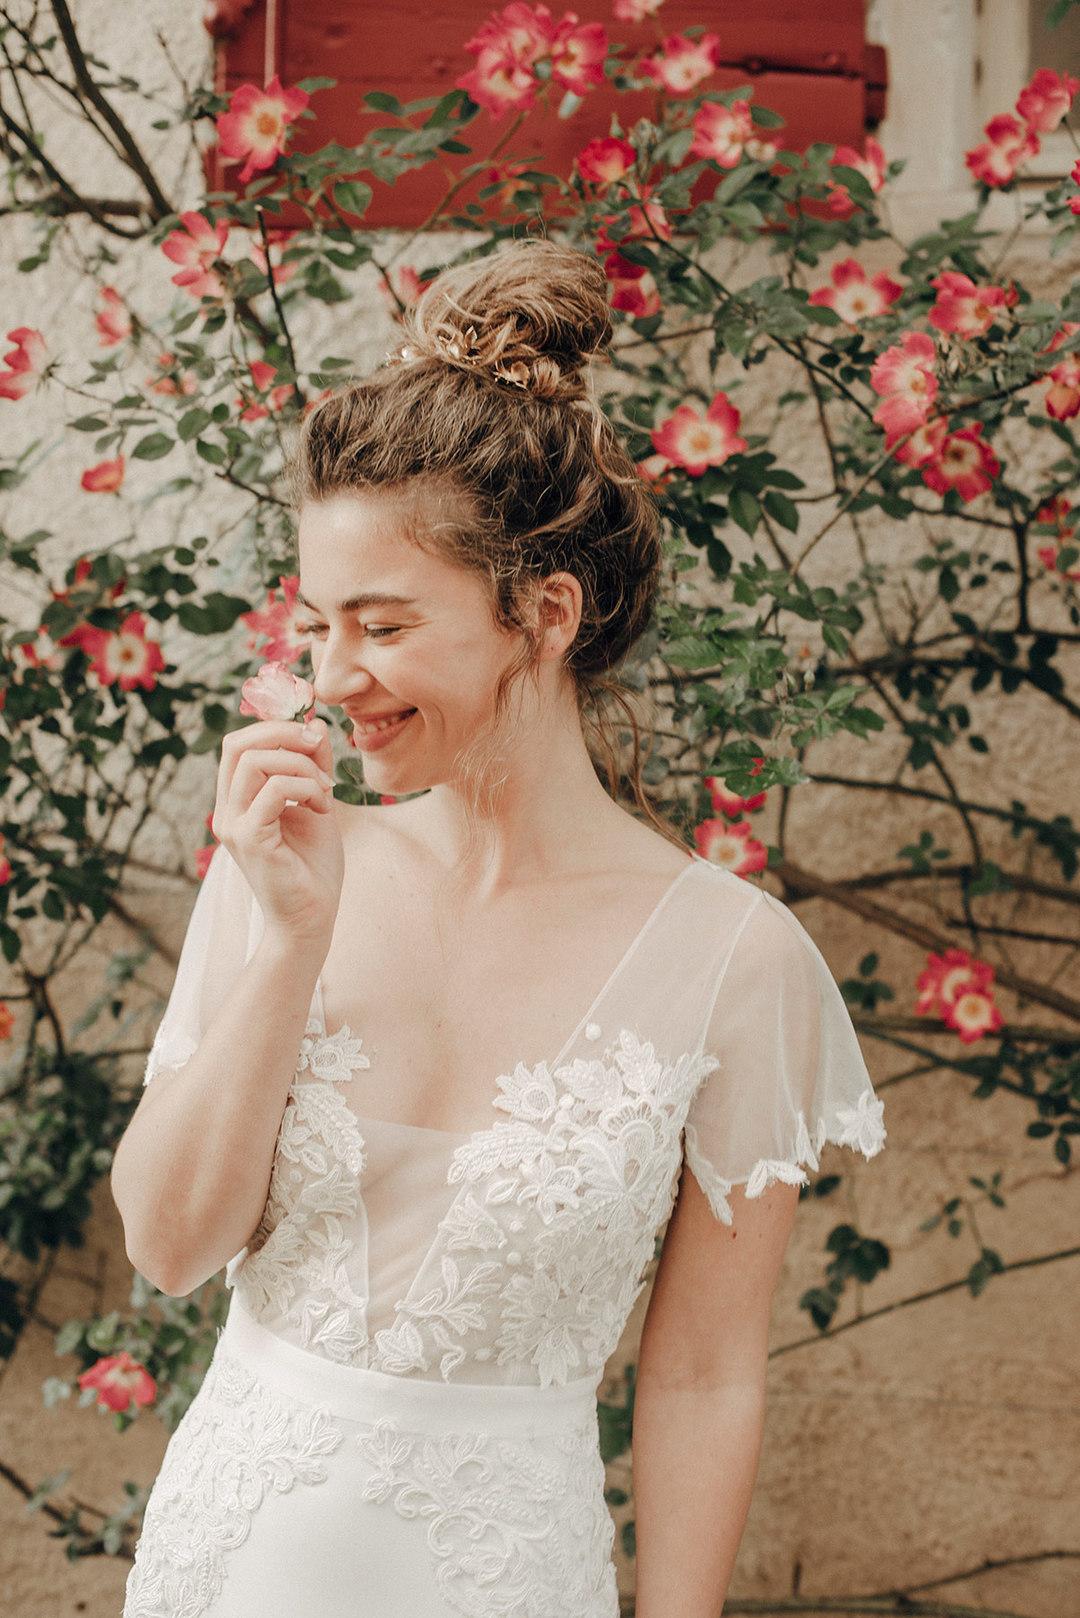 thelma dress photo